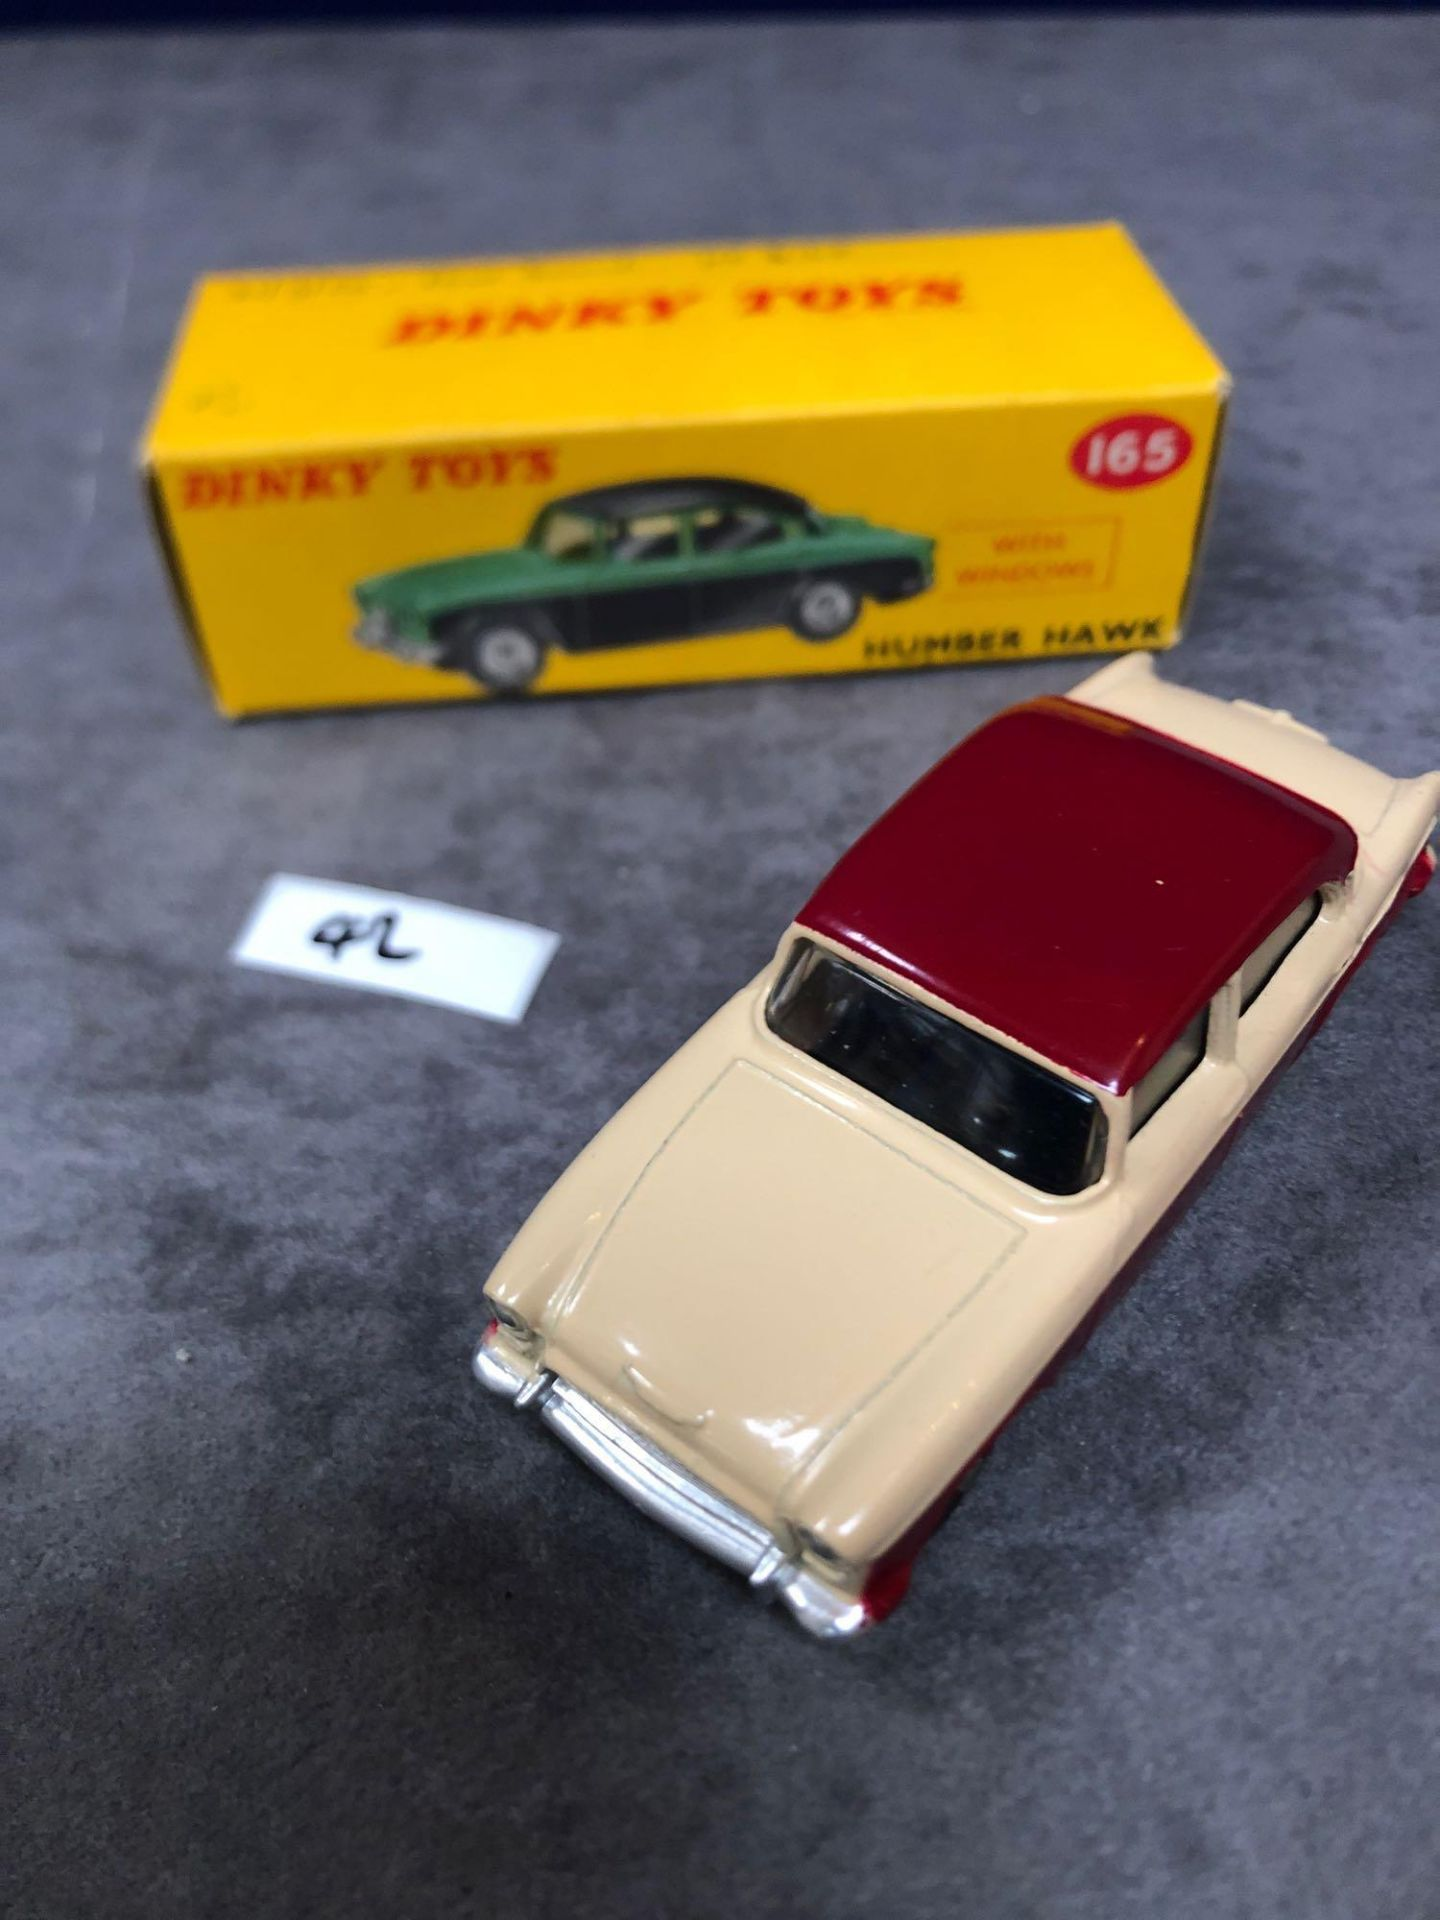 Dinky #165 Humber Hawk Maroon/Fawn - Spun Hubs With Box 1959-1963